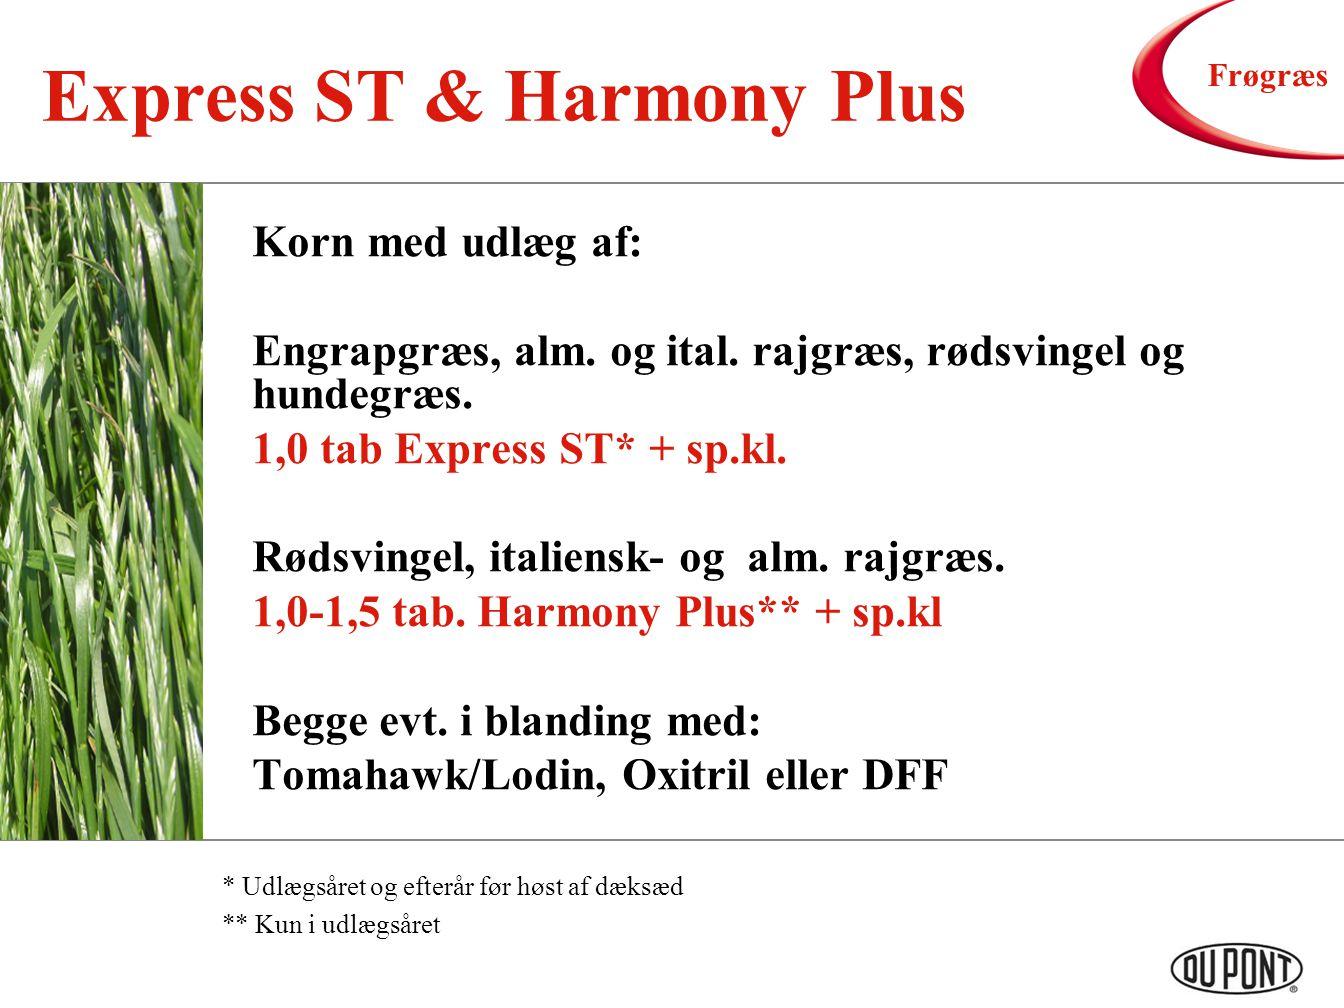 Express ST & Harmony Plus